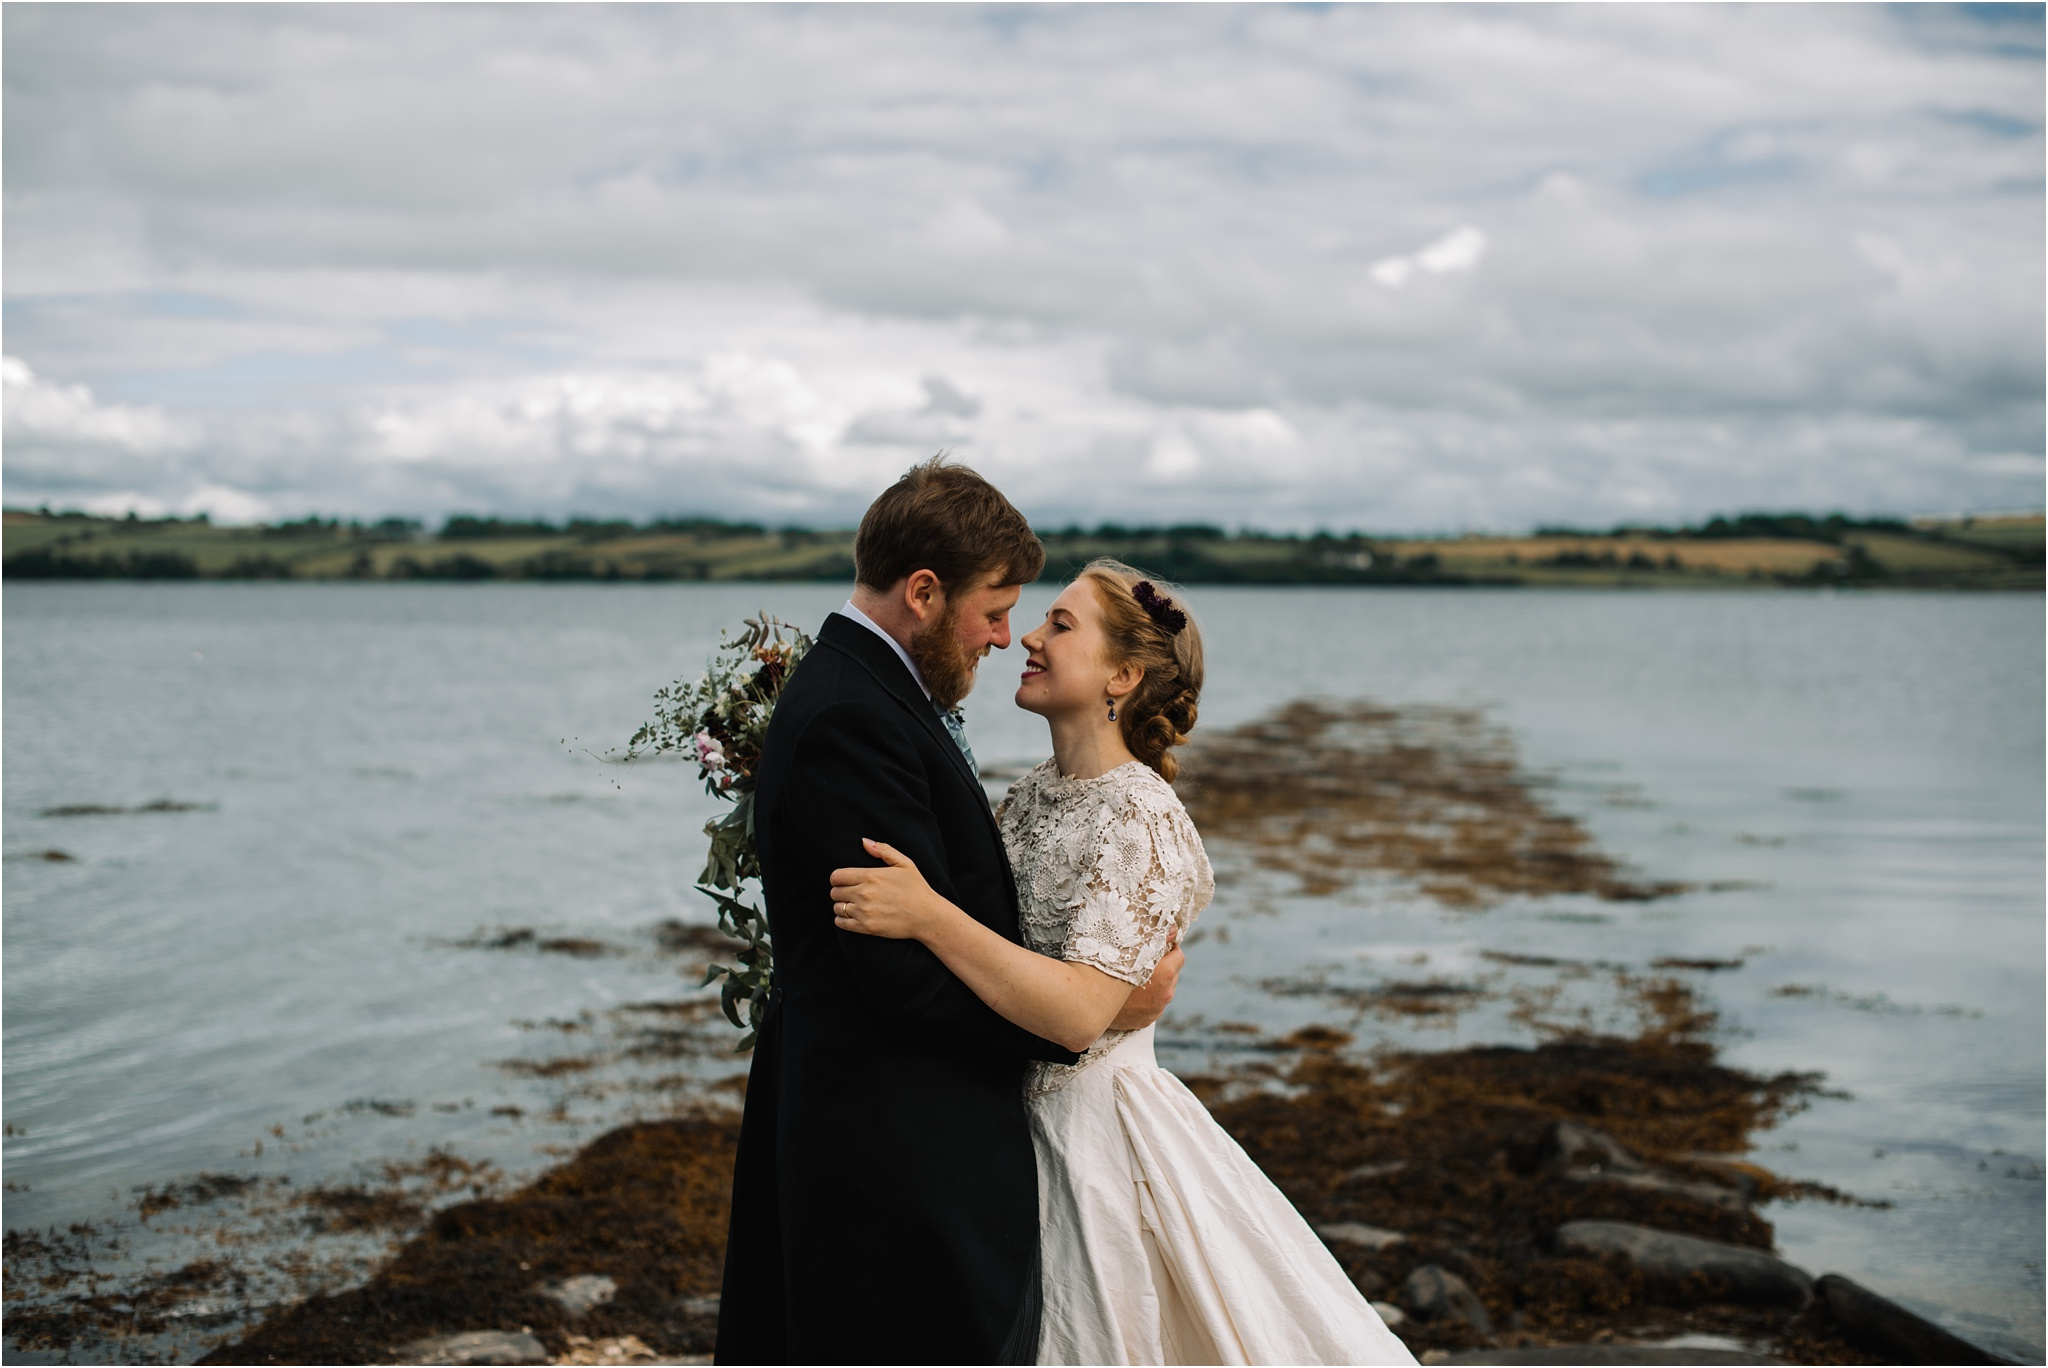 Outdoor-country-wedding-Edinburgh-photographer__0053.jpg